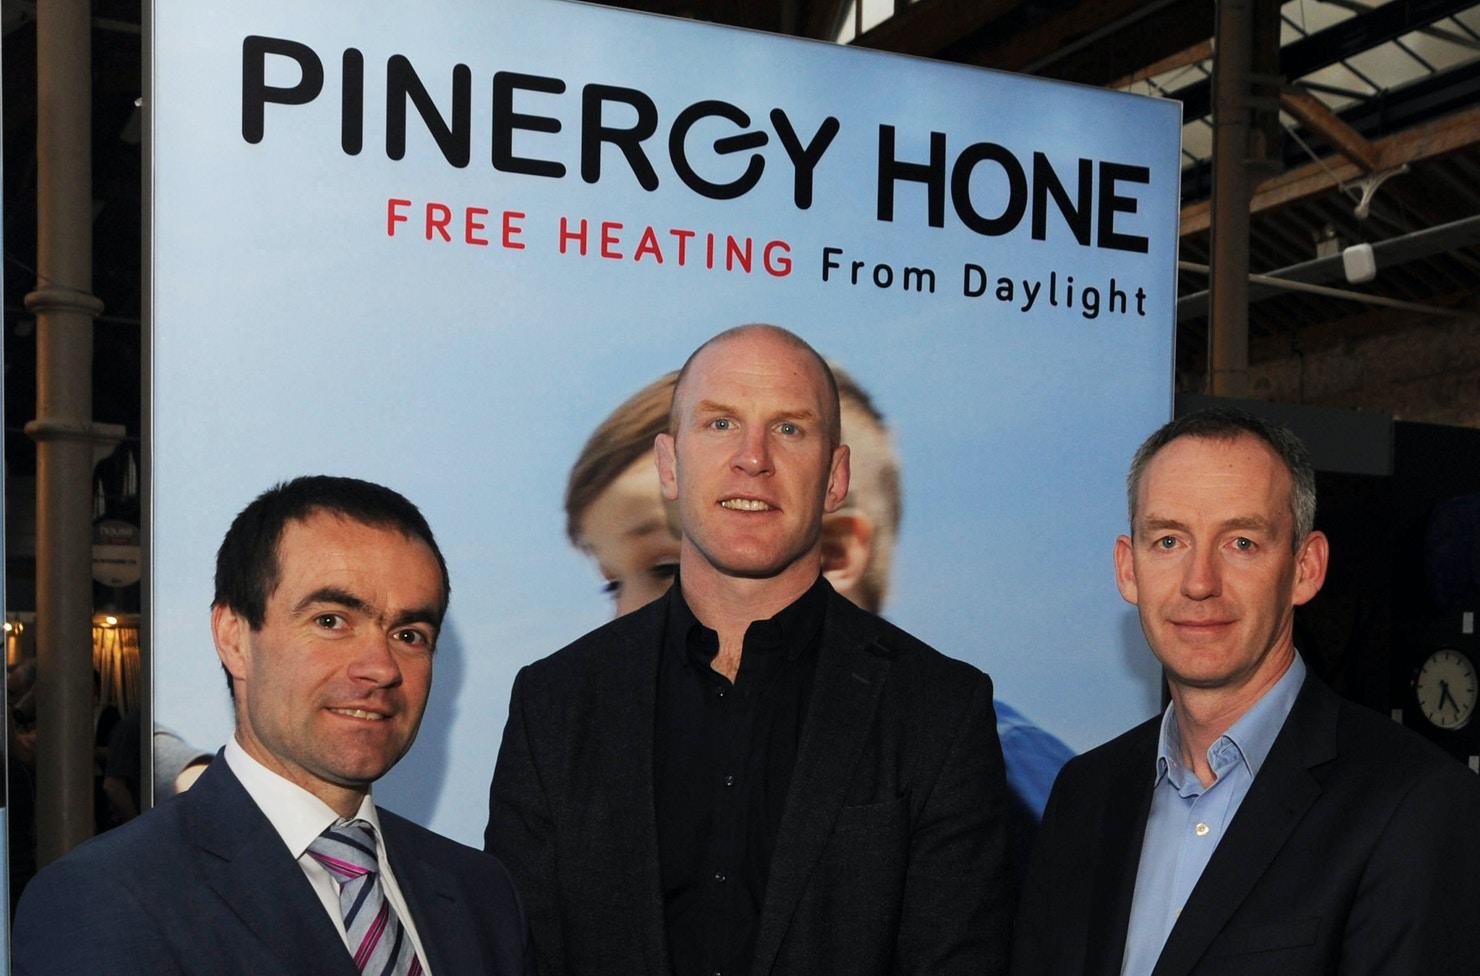 Pinergys partnership with HONE